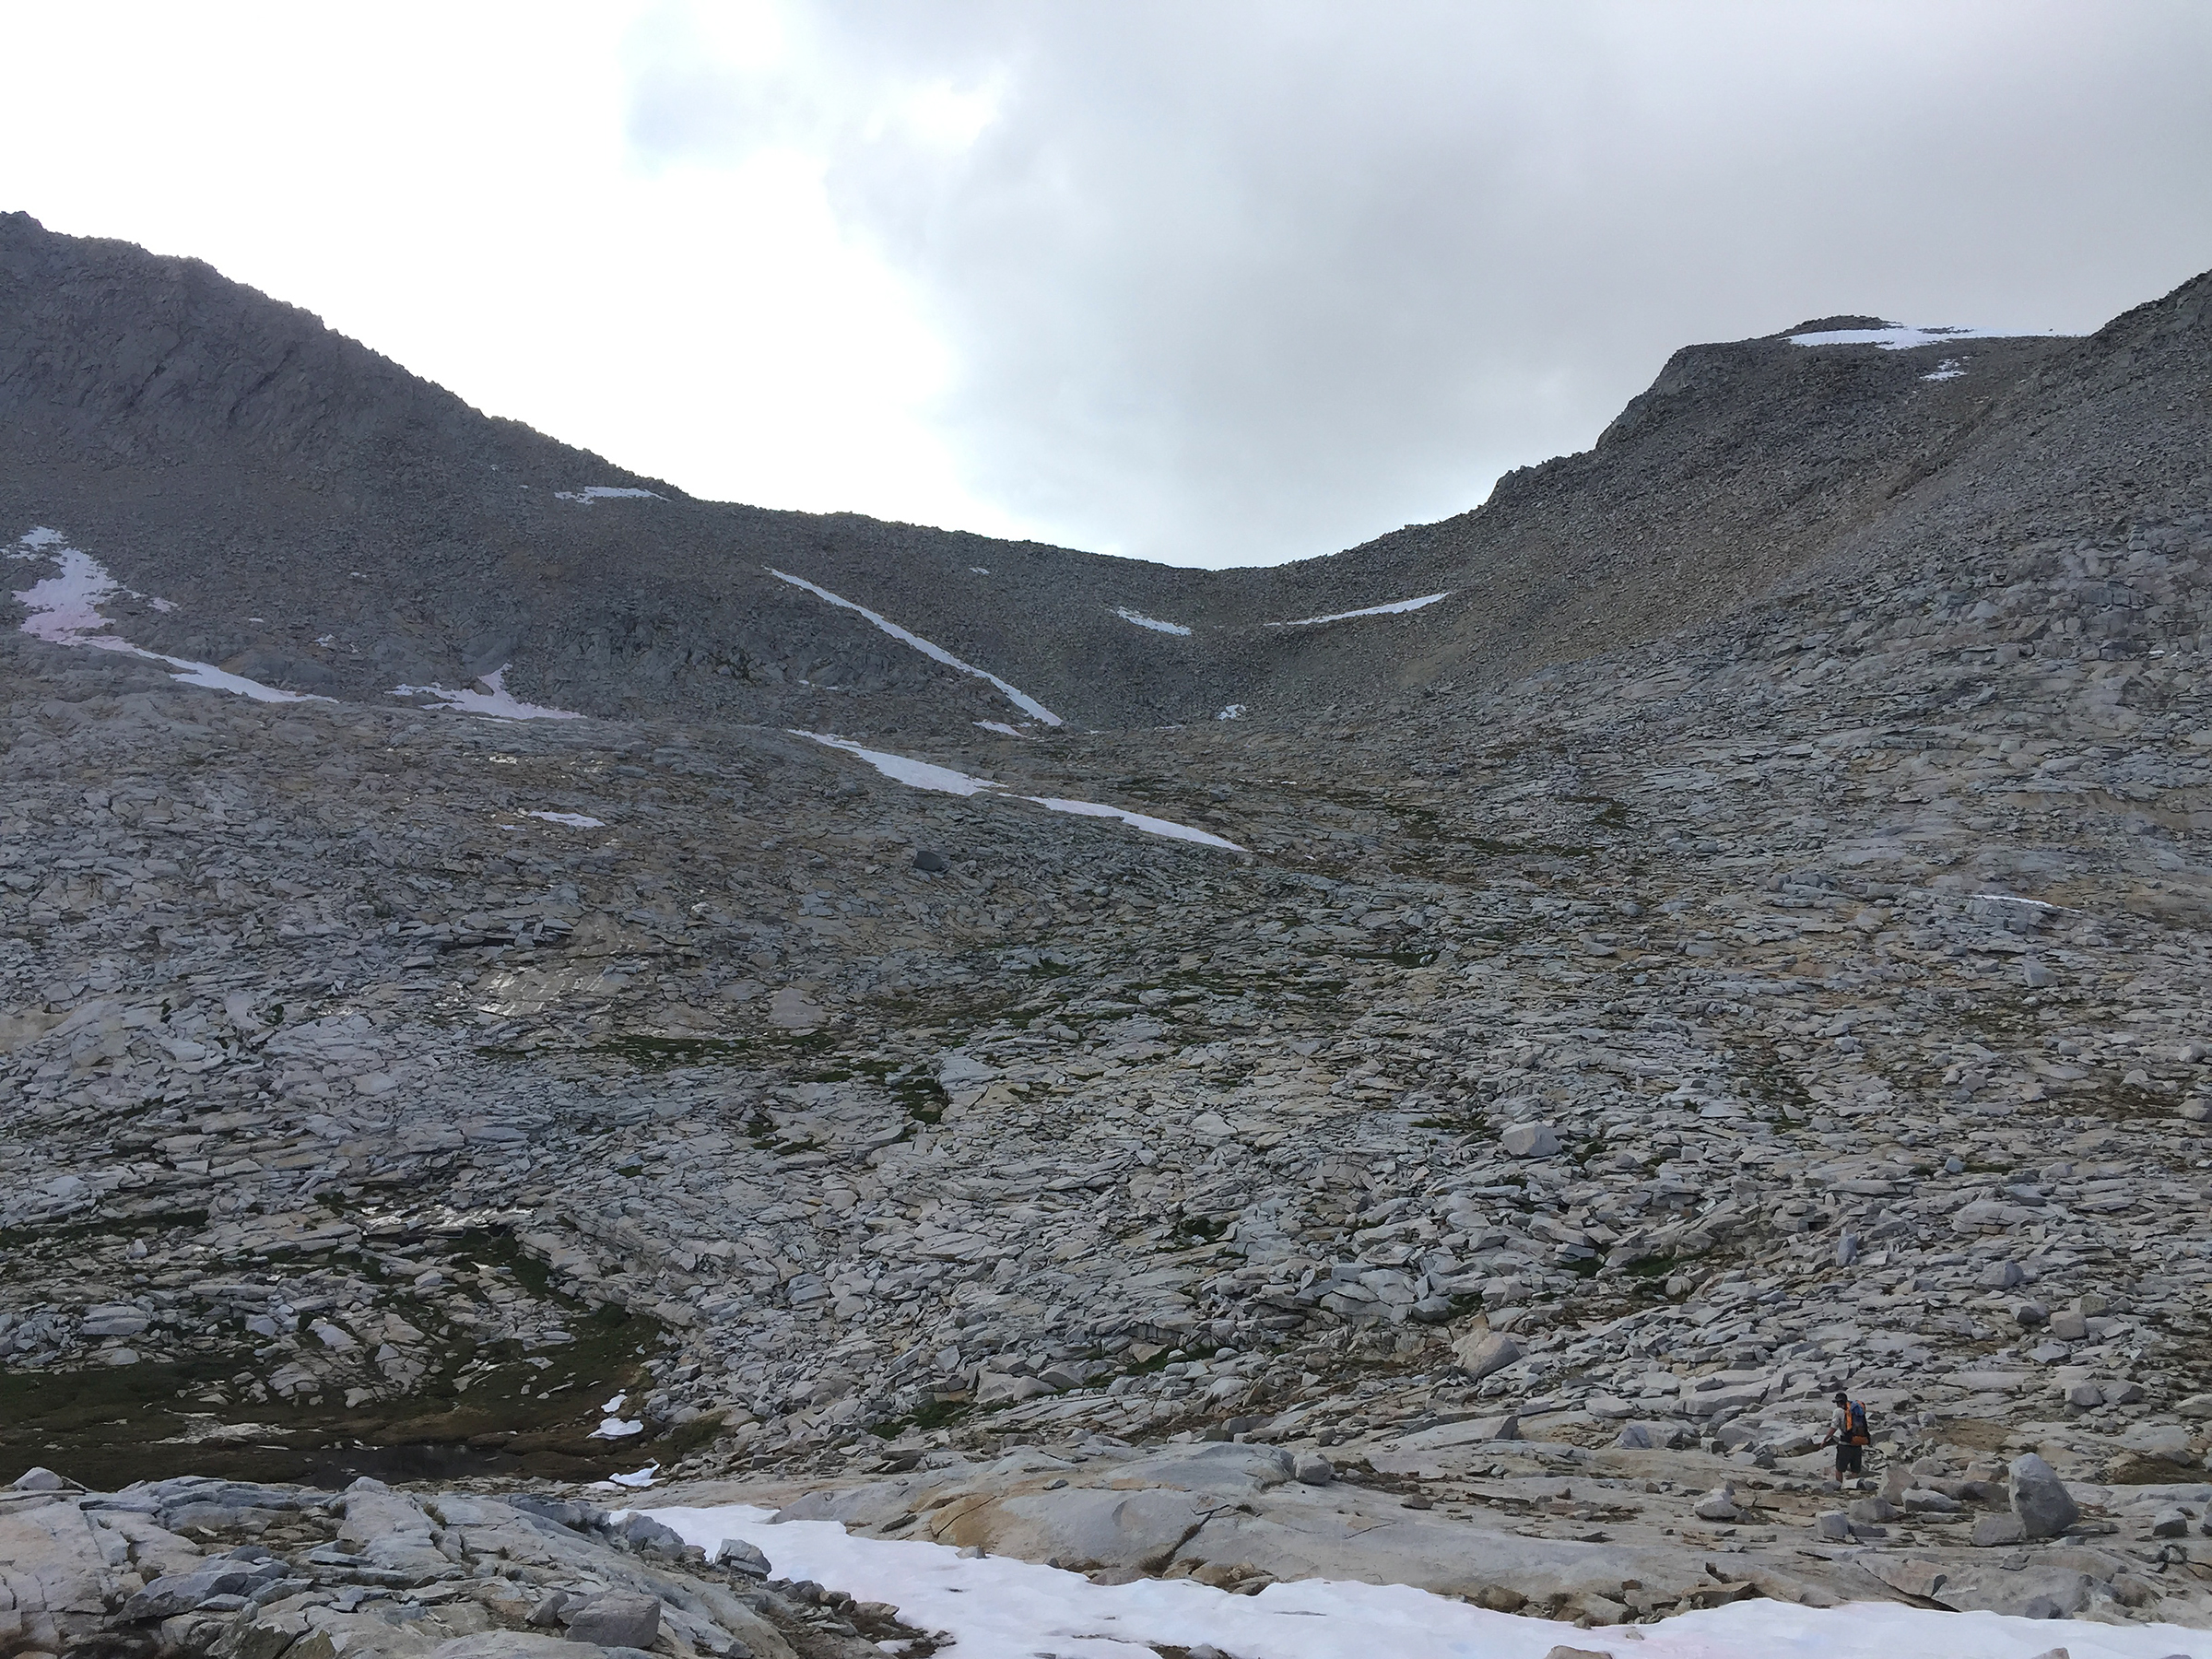 trailname-backstroke-sierra-high-route-2017_0944.jpg